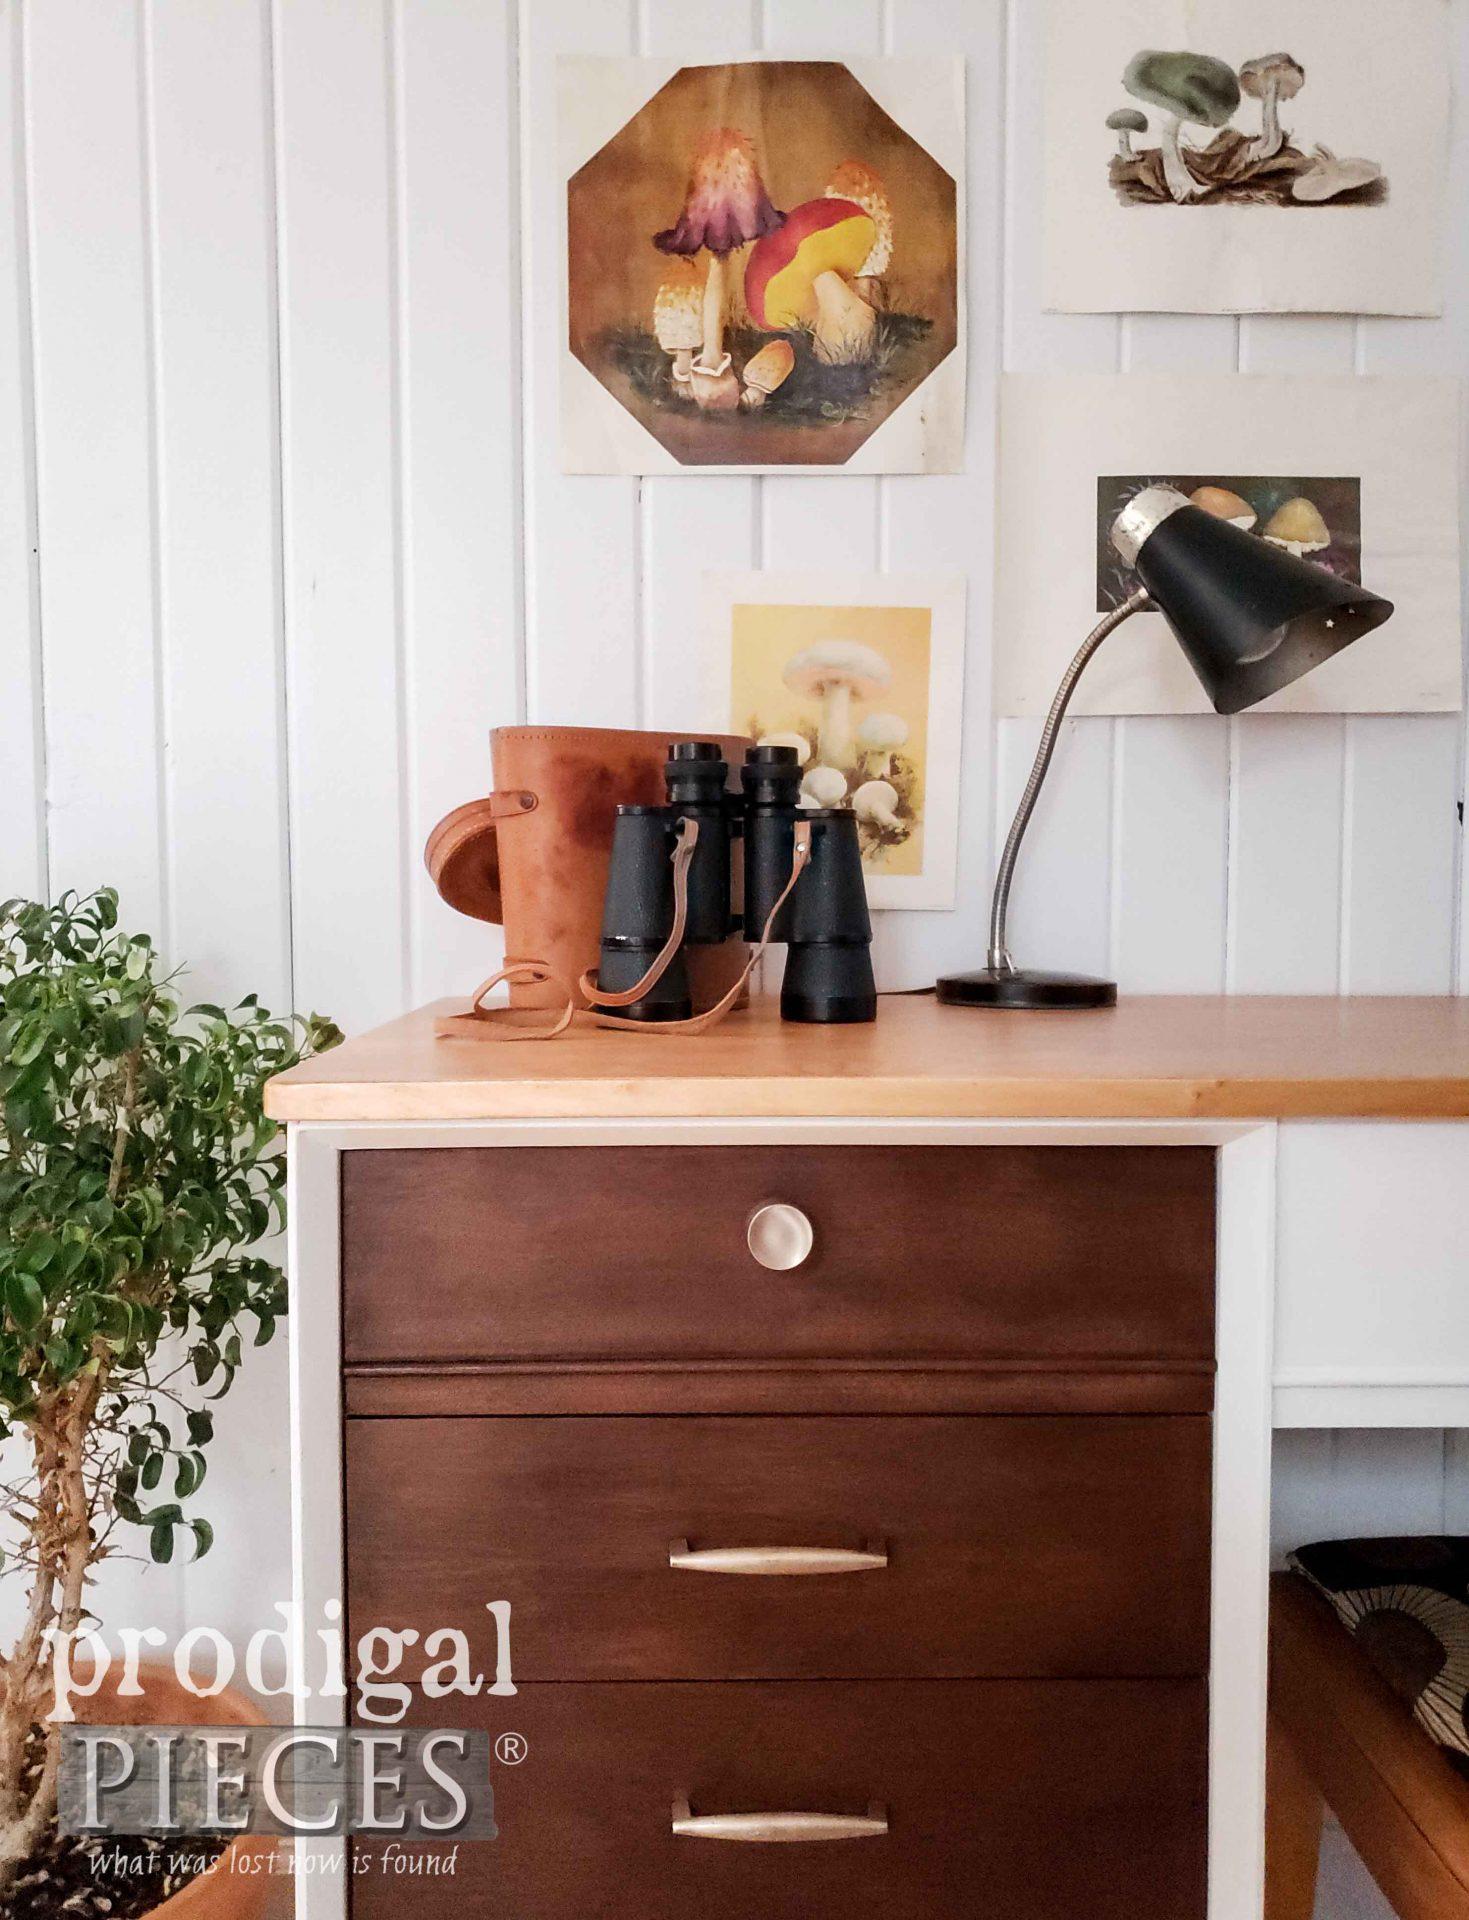 Mid Century Modern Desk Drawer with Original Brass Knobs by Larissa of Prodigal Pieces | prodigalpieces.com #prodigalpieces #furniture #diy #home #homedecor #midcentury #modern #vintage